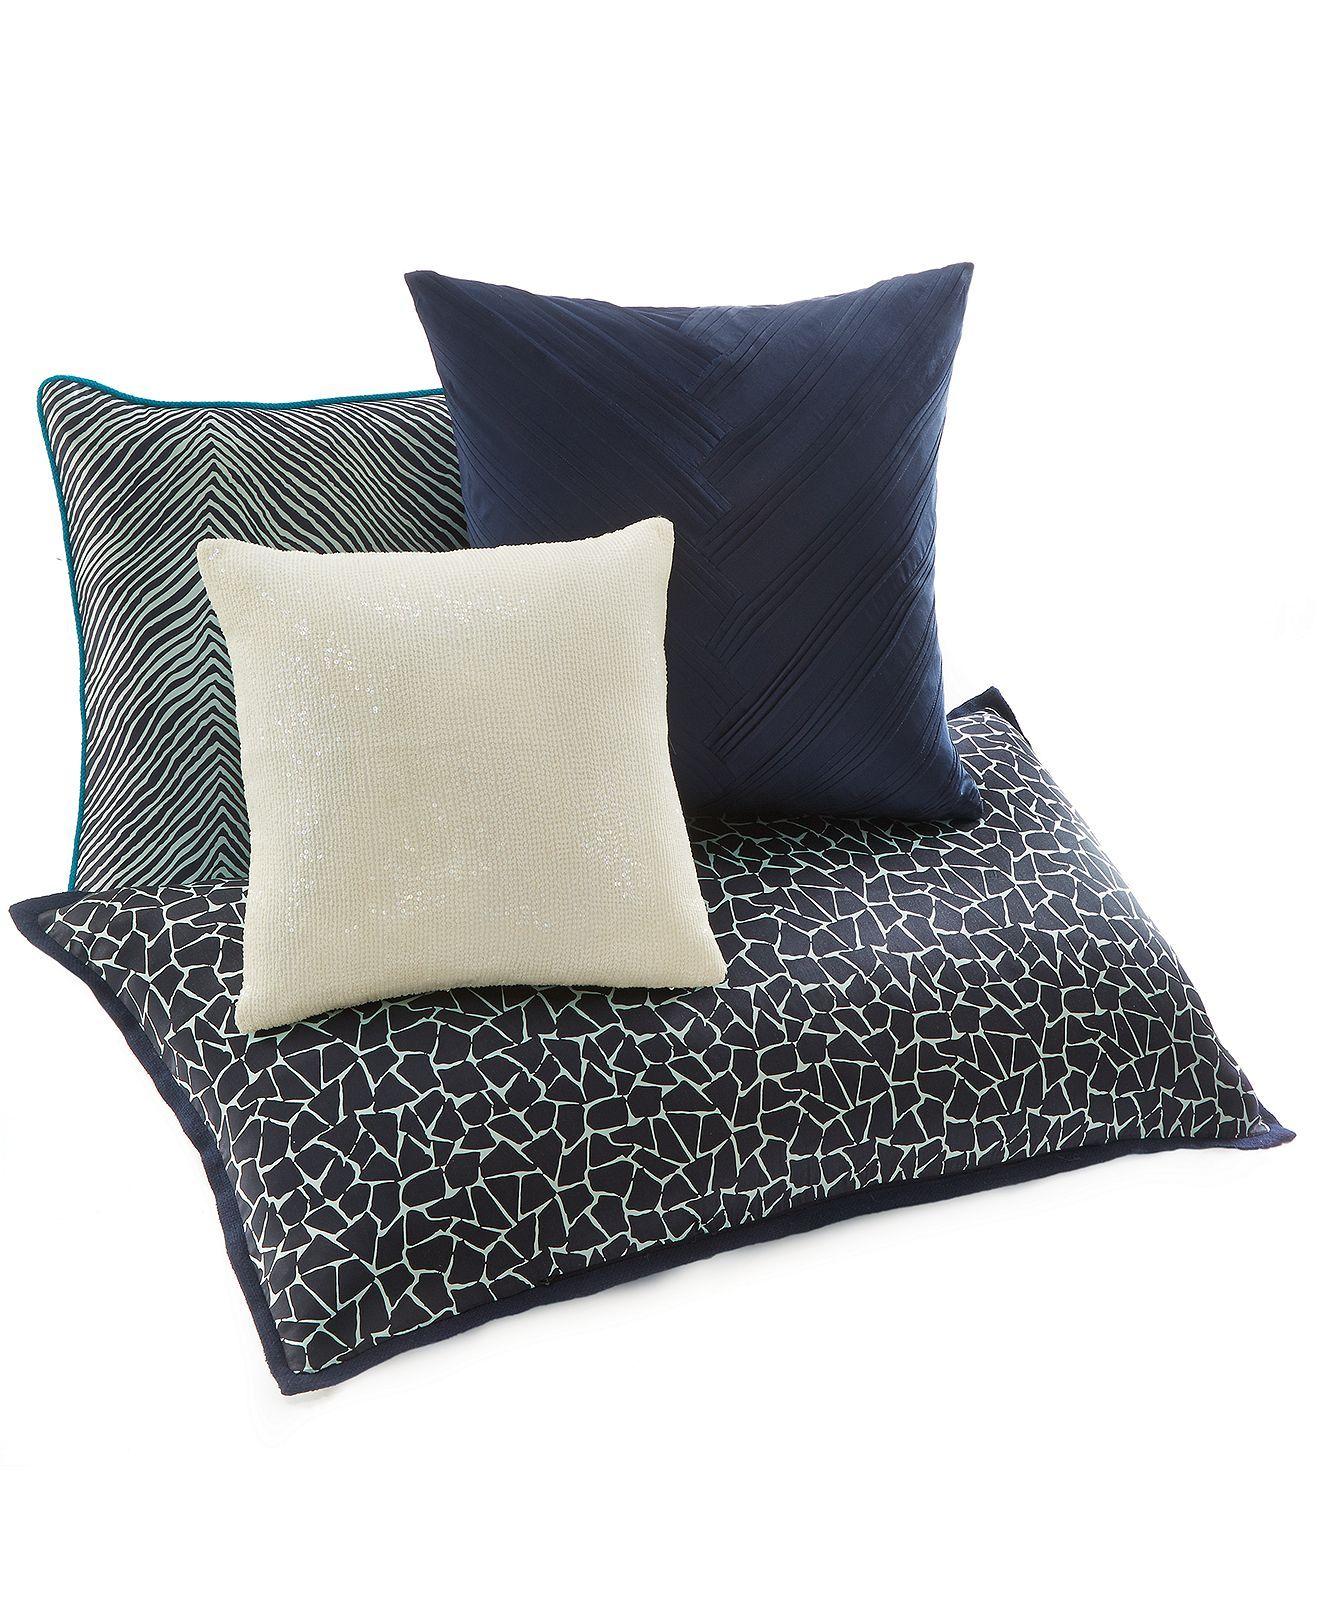 Macys Sofa Pillows Sectional Storage Vince Camuto Devon Decorative Pillow Collection